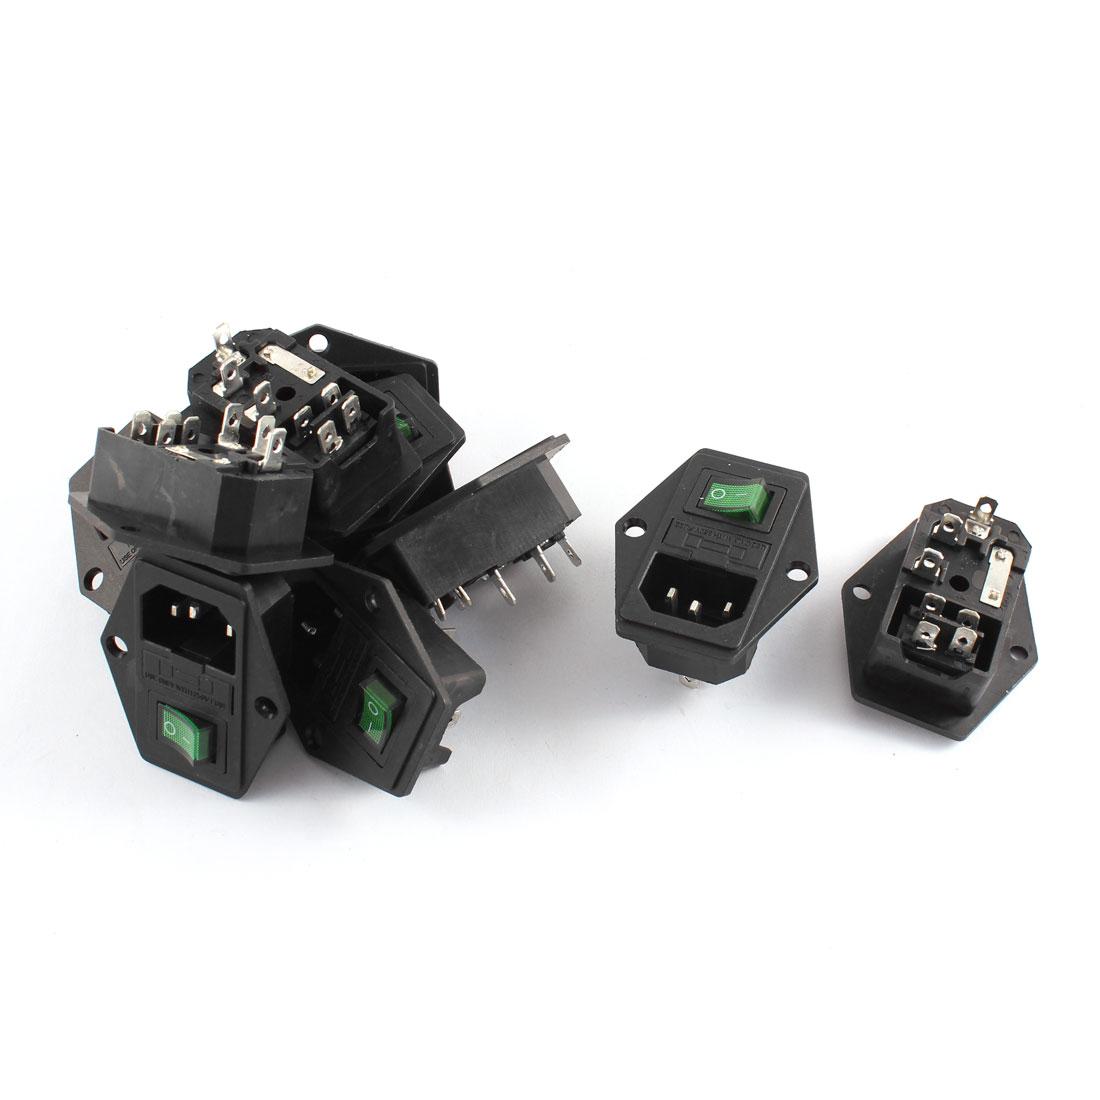 10 Pcs Plastic Housing AC-19 C14 Power Socket 7 Terminals w Fuse Holder